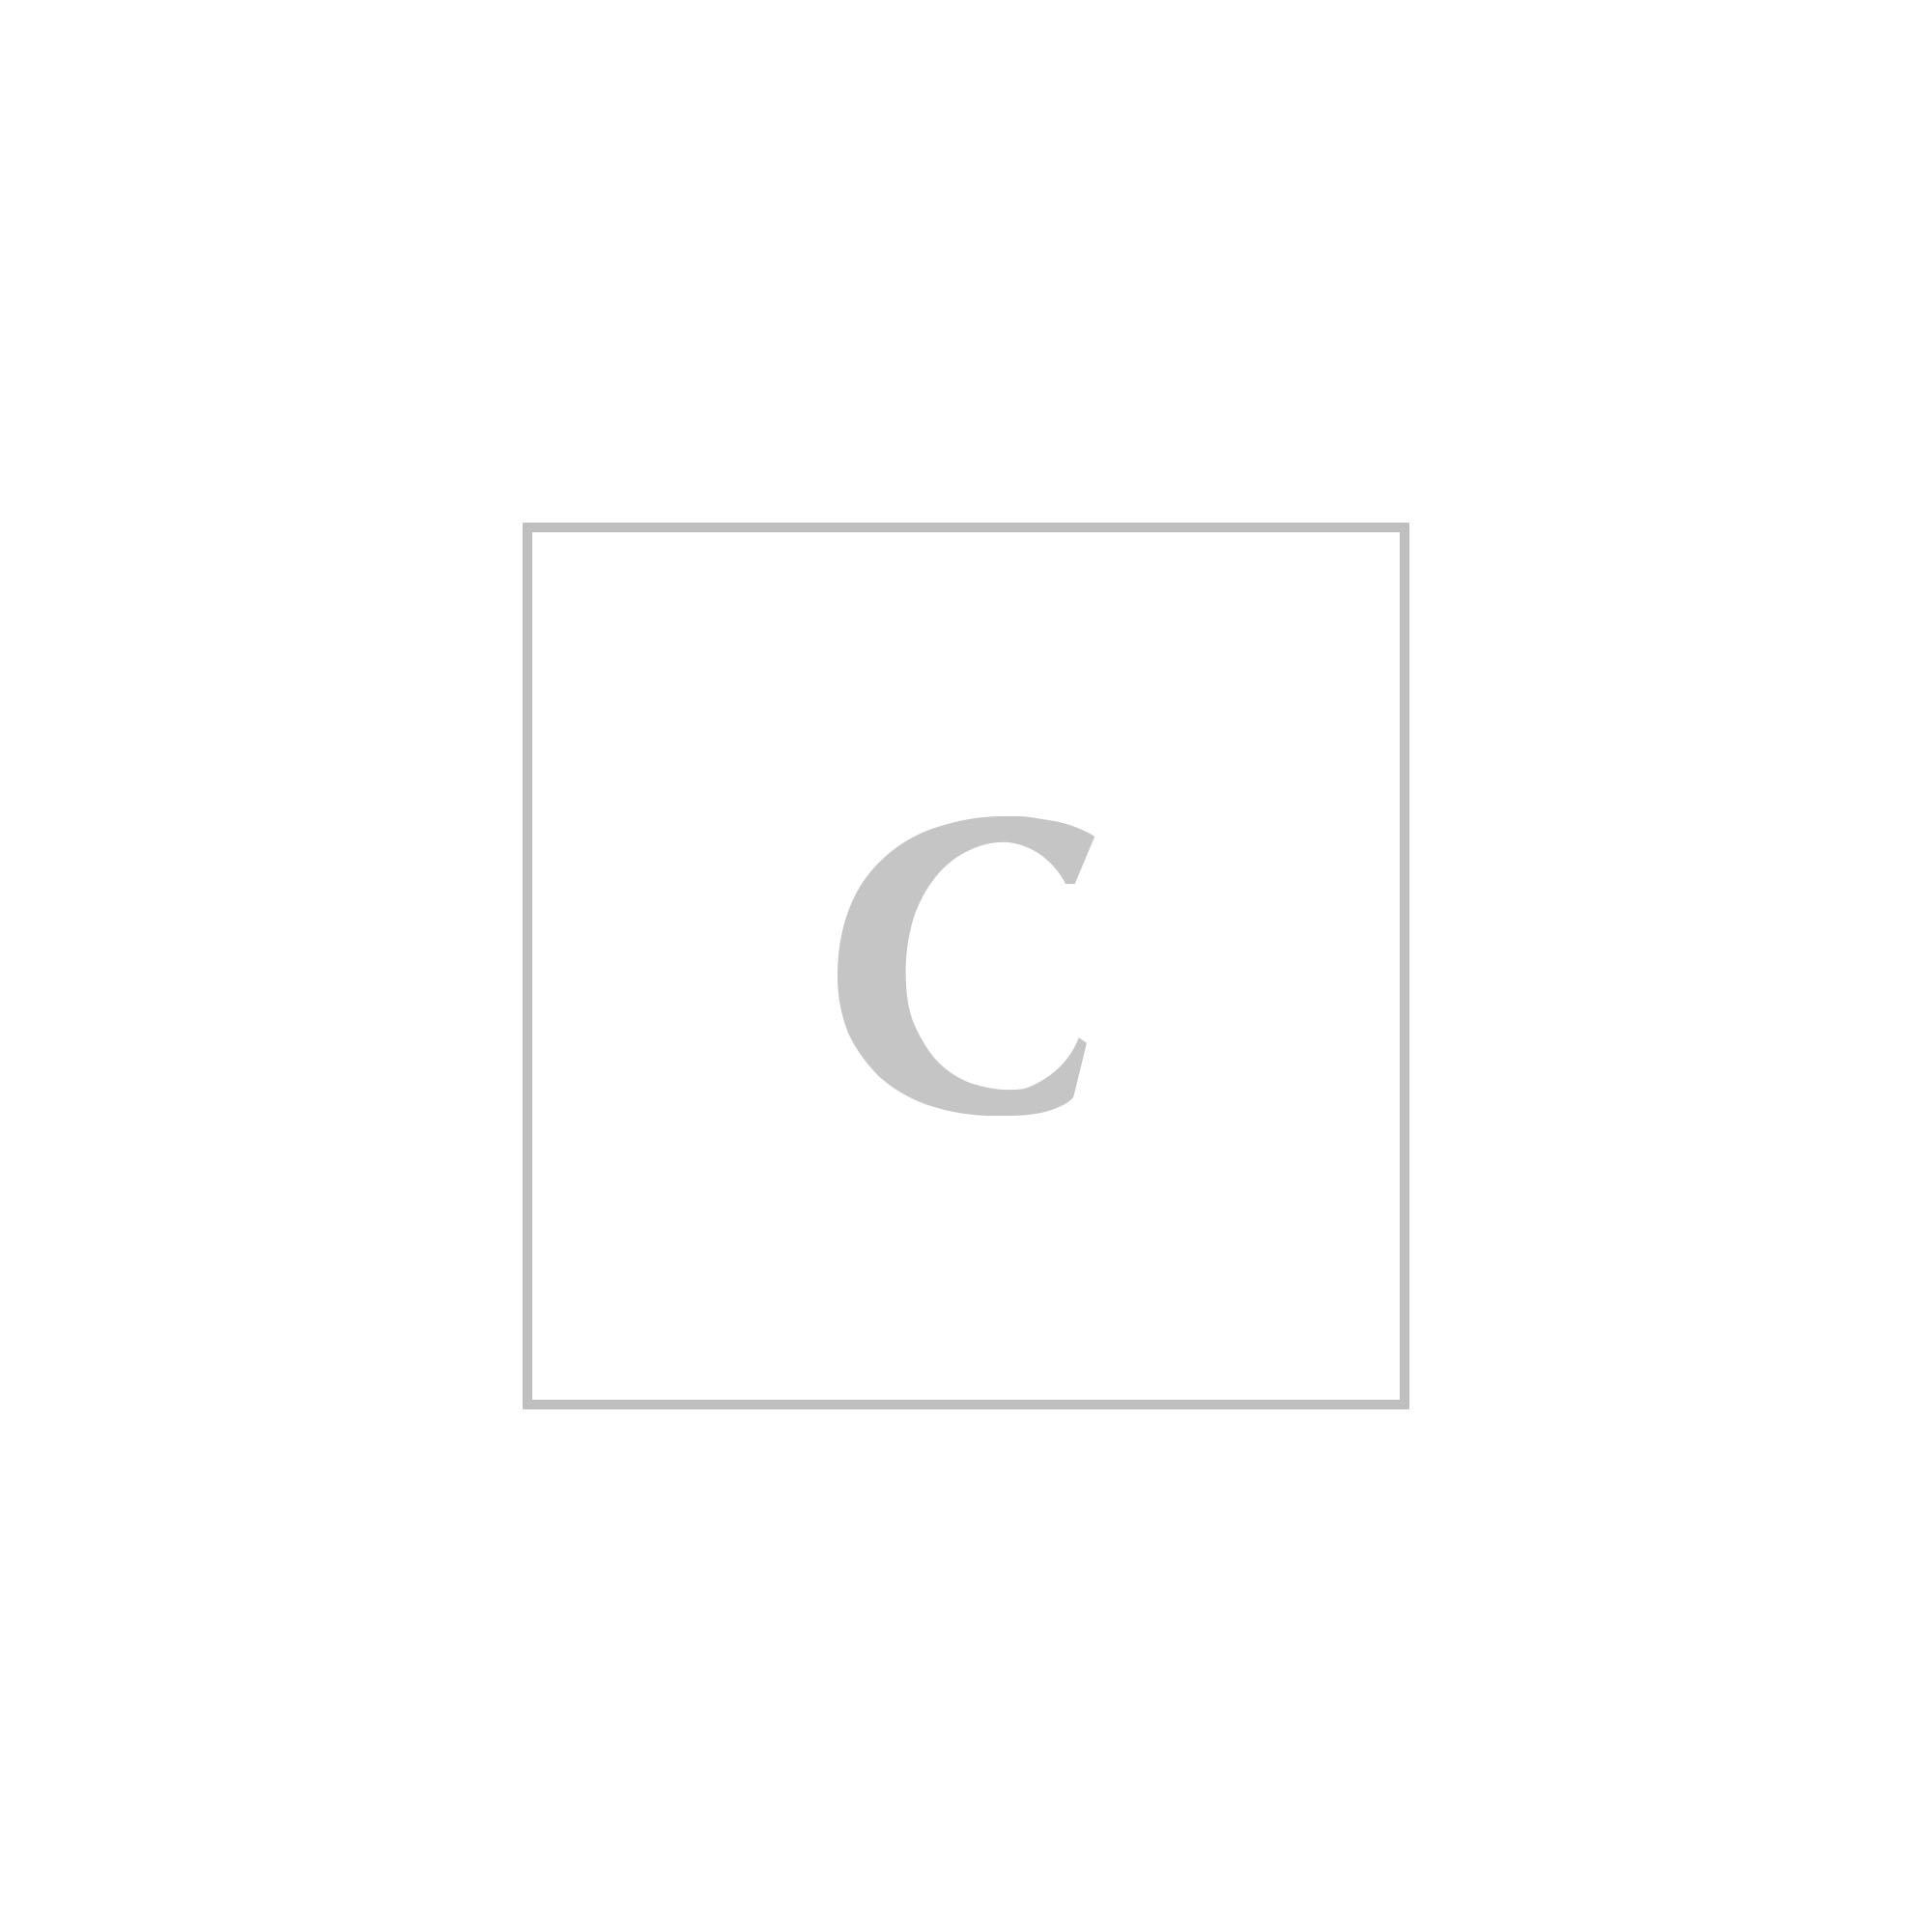 Christian Dior cannage miss dior bag